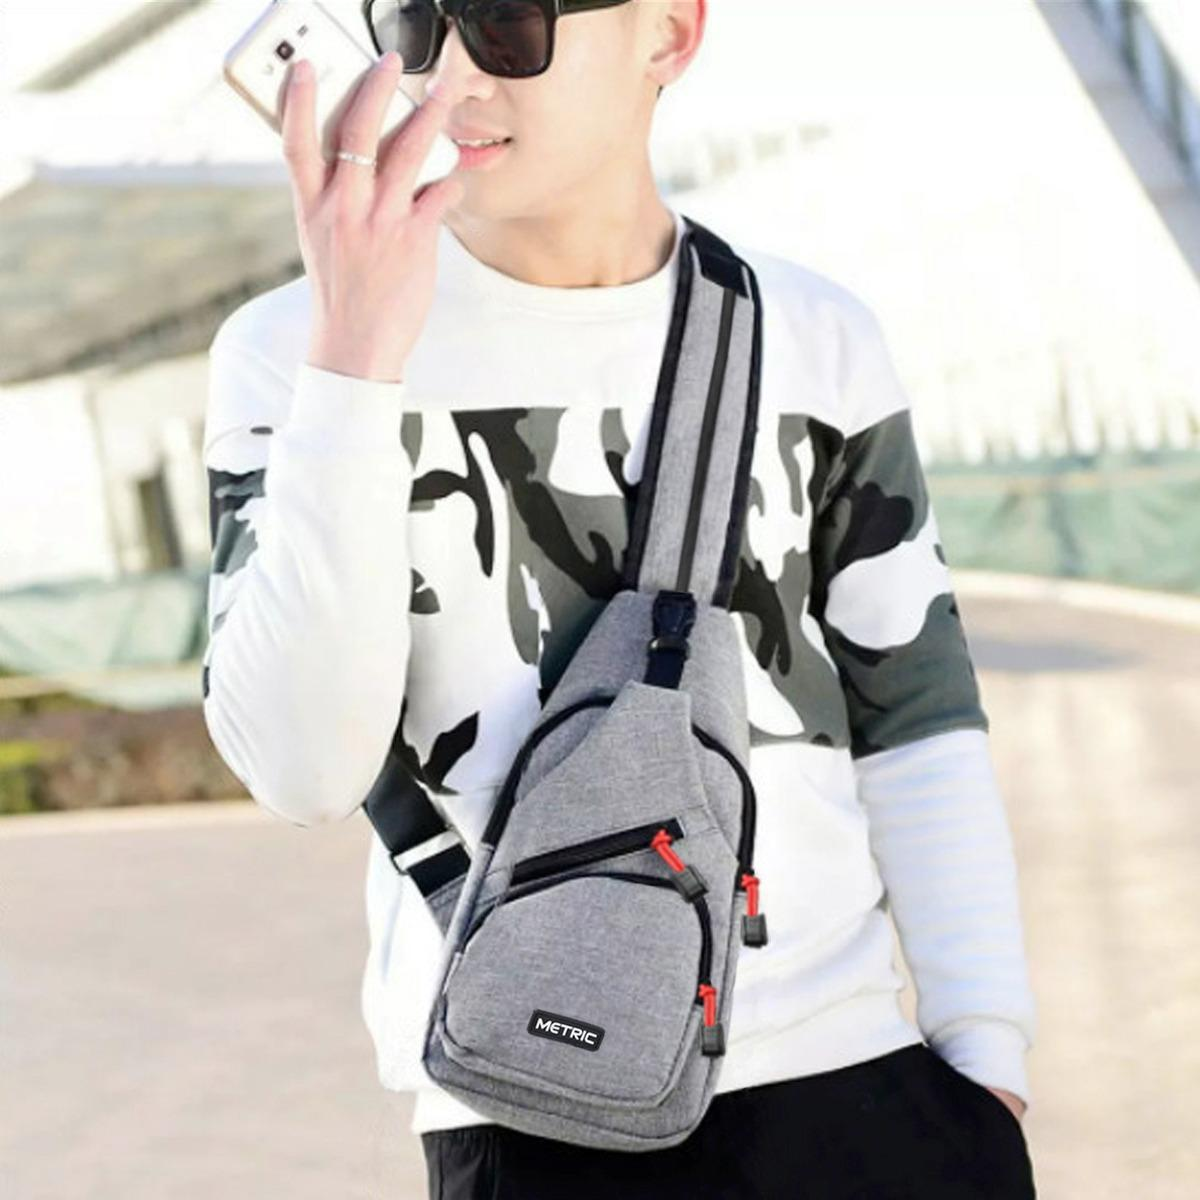 Beli Metric Tas Ransel Tas Waistbag Tas Selempang Tas Gadget Size 10 Inchi Bisa Ransel Tali Satu Dan Ransel Tali Dua Grey Di Dki Jakarta